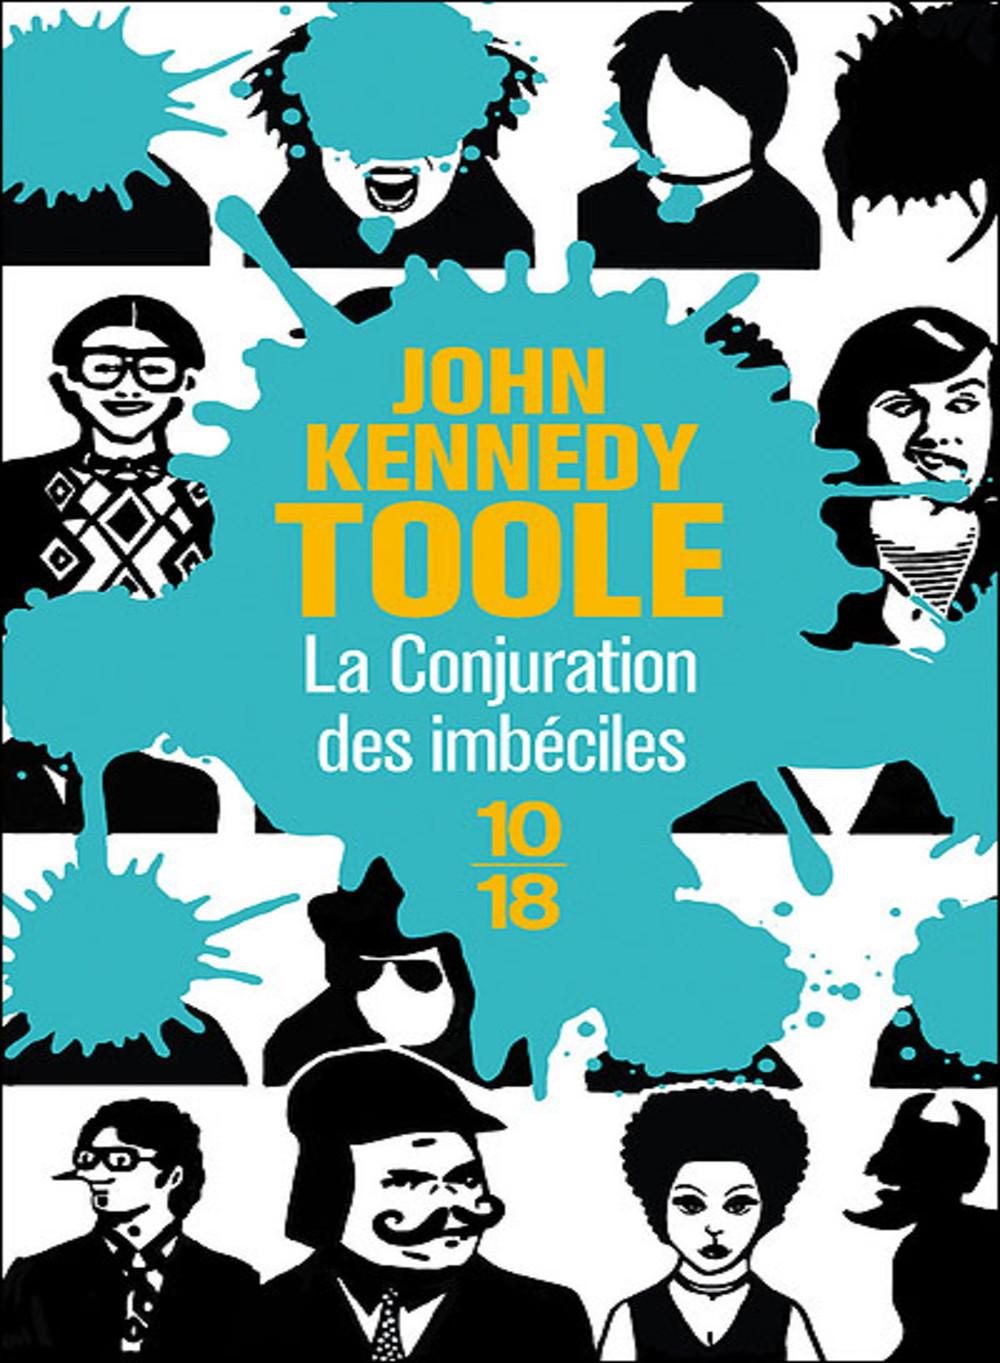 La Conjuration Des Imbeciles De John Kennedy Toole